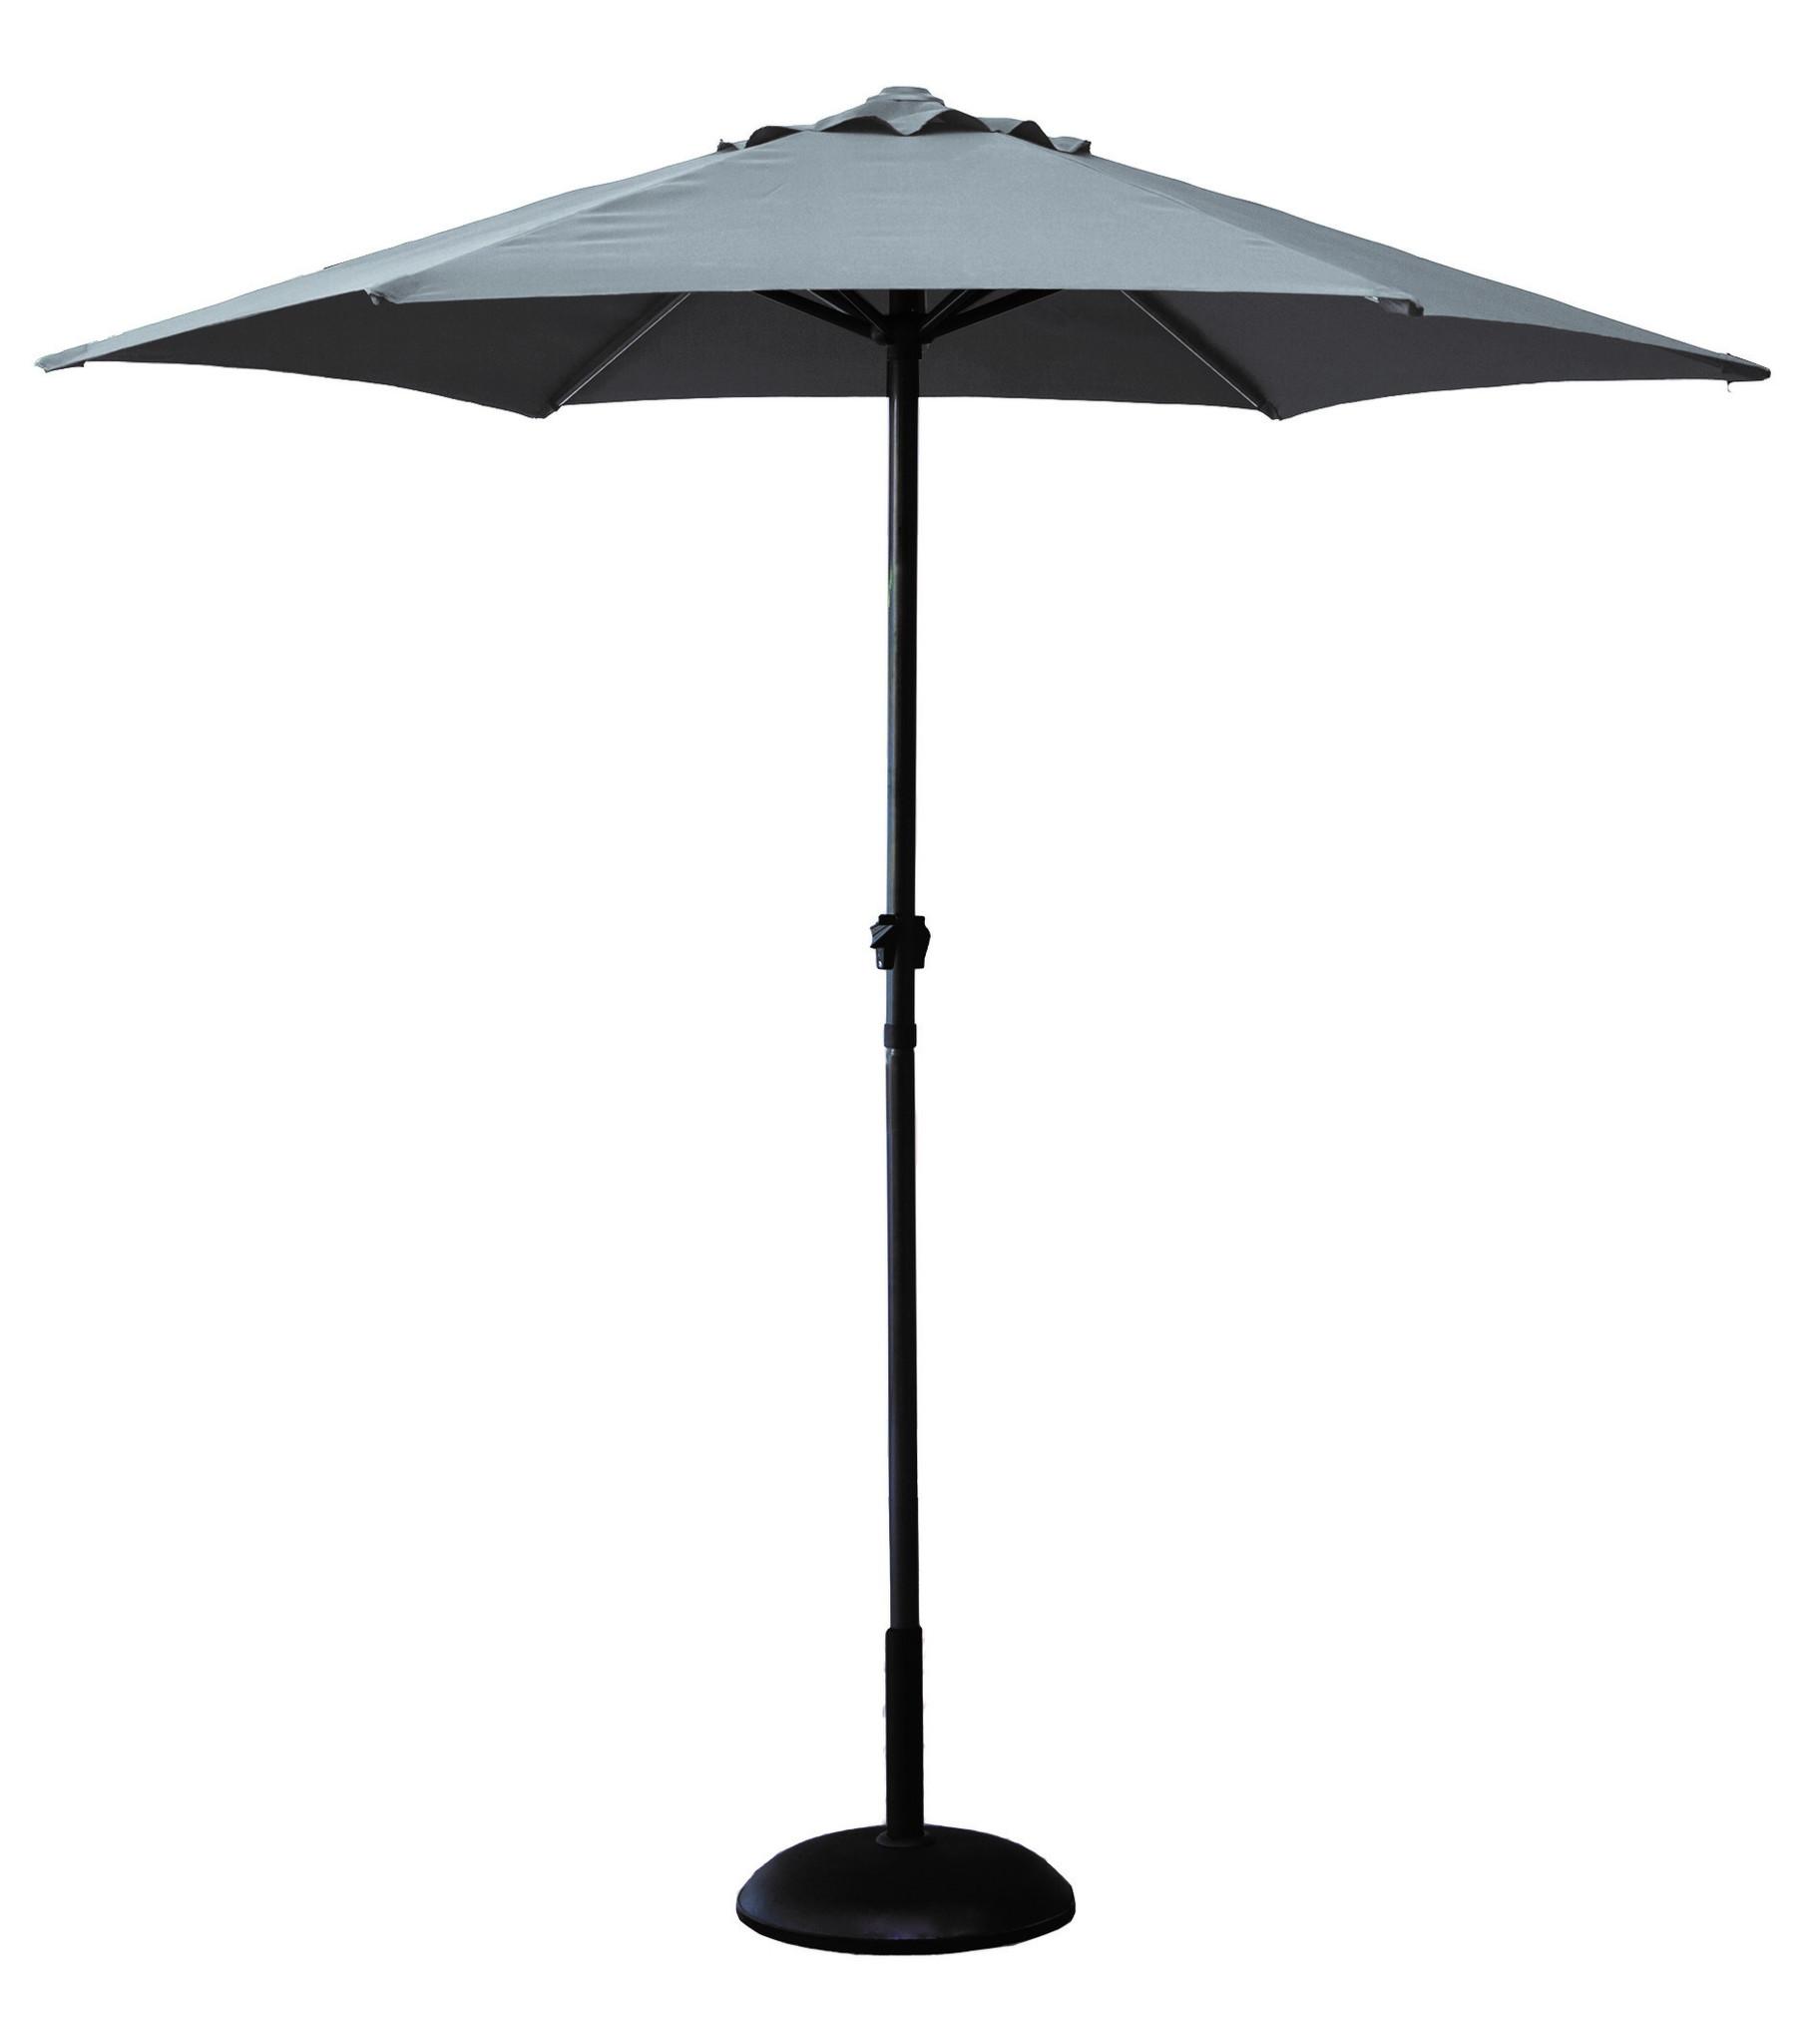 gardman garden parasol grey cover umbrella furniture crankopening aluminium ebay. Black Bedroom Furniture Sets. Home Design Ideas